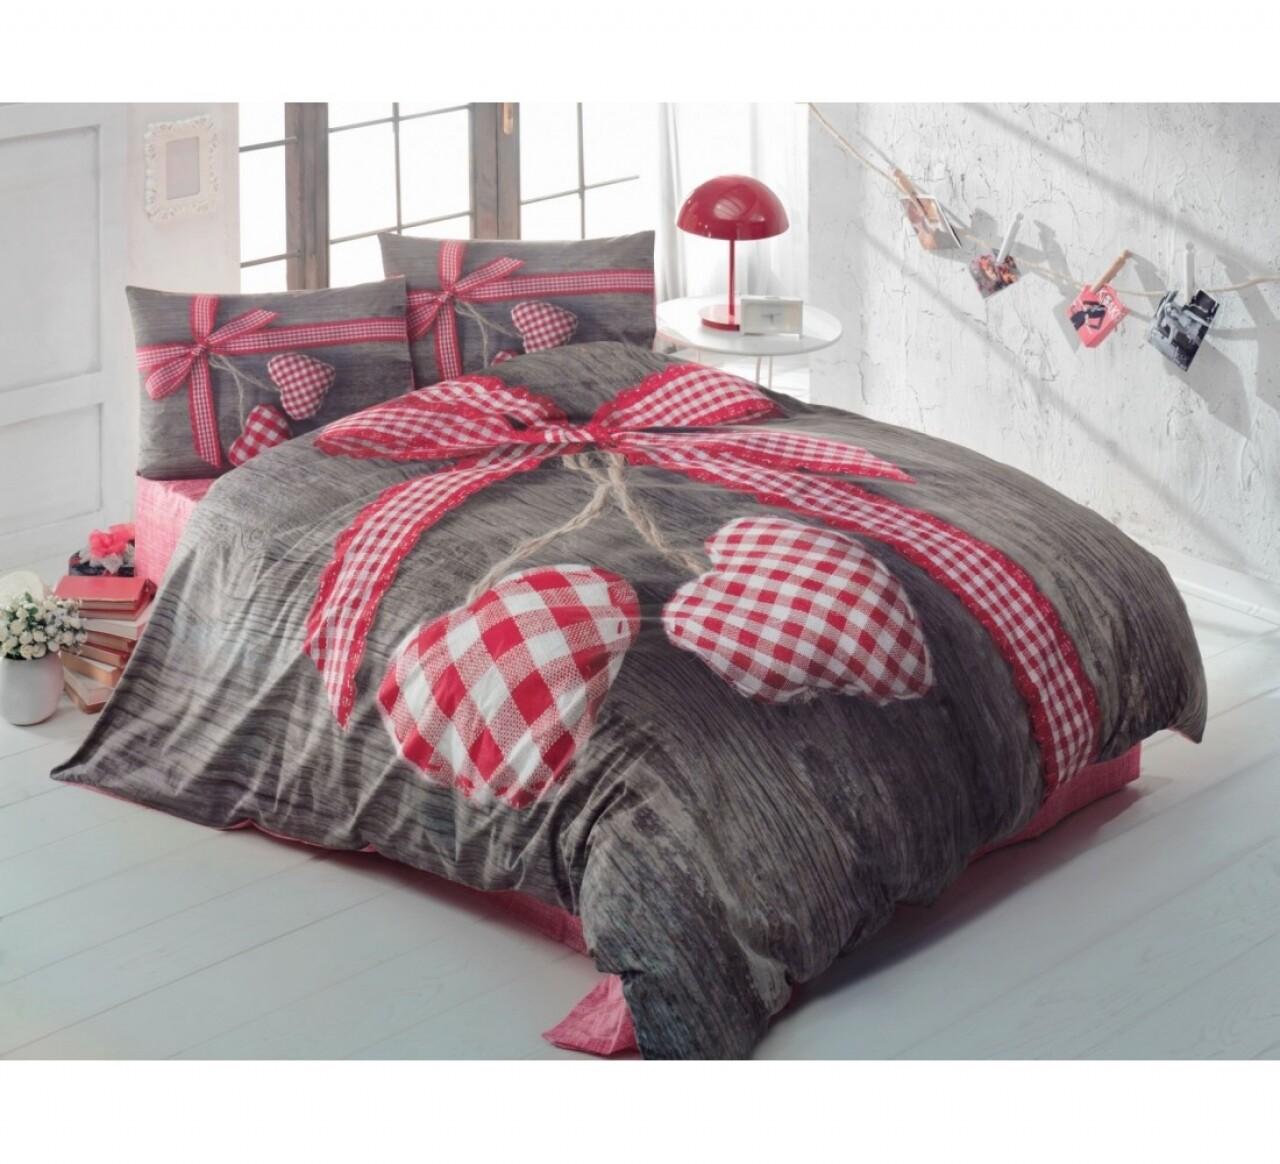 Lenjerie de pat pentru doua persoane Cotton Box, Bumbac Ranforce, 4 piese, Lovebox - Red